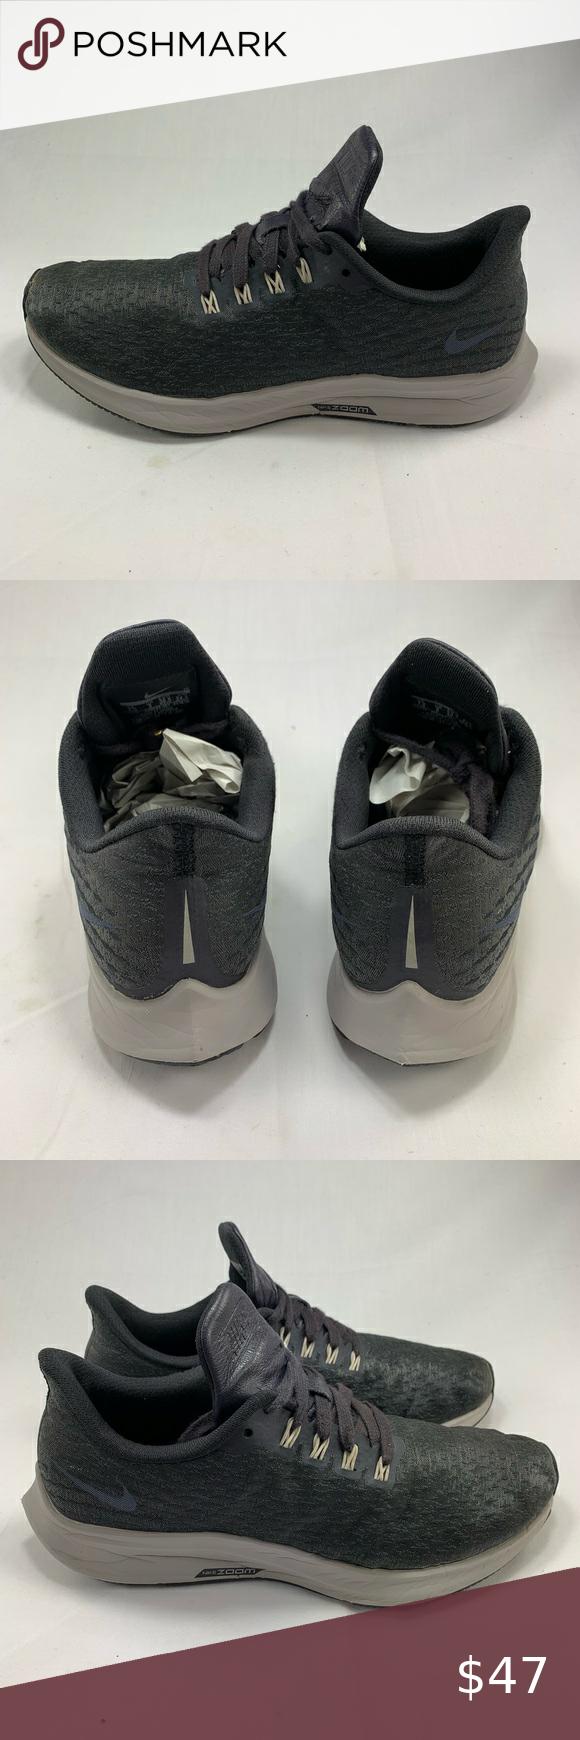 Turismo uvas clima  Nike Air Zoom Pegasus 39 - Charcoal - Sz 7.5 in 2020 | Nike air zoom pegasus,  All black sneakers, Air zoom